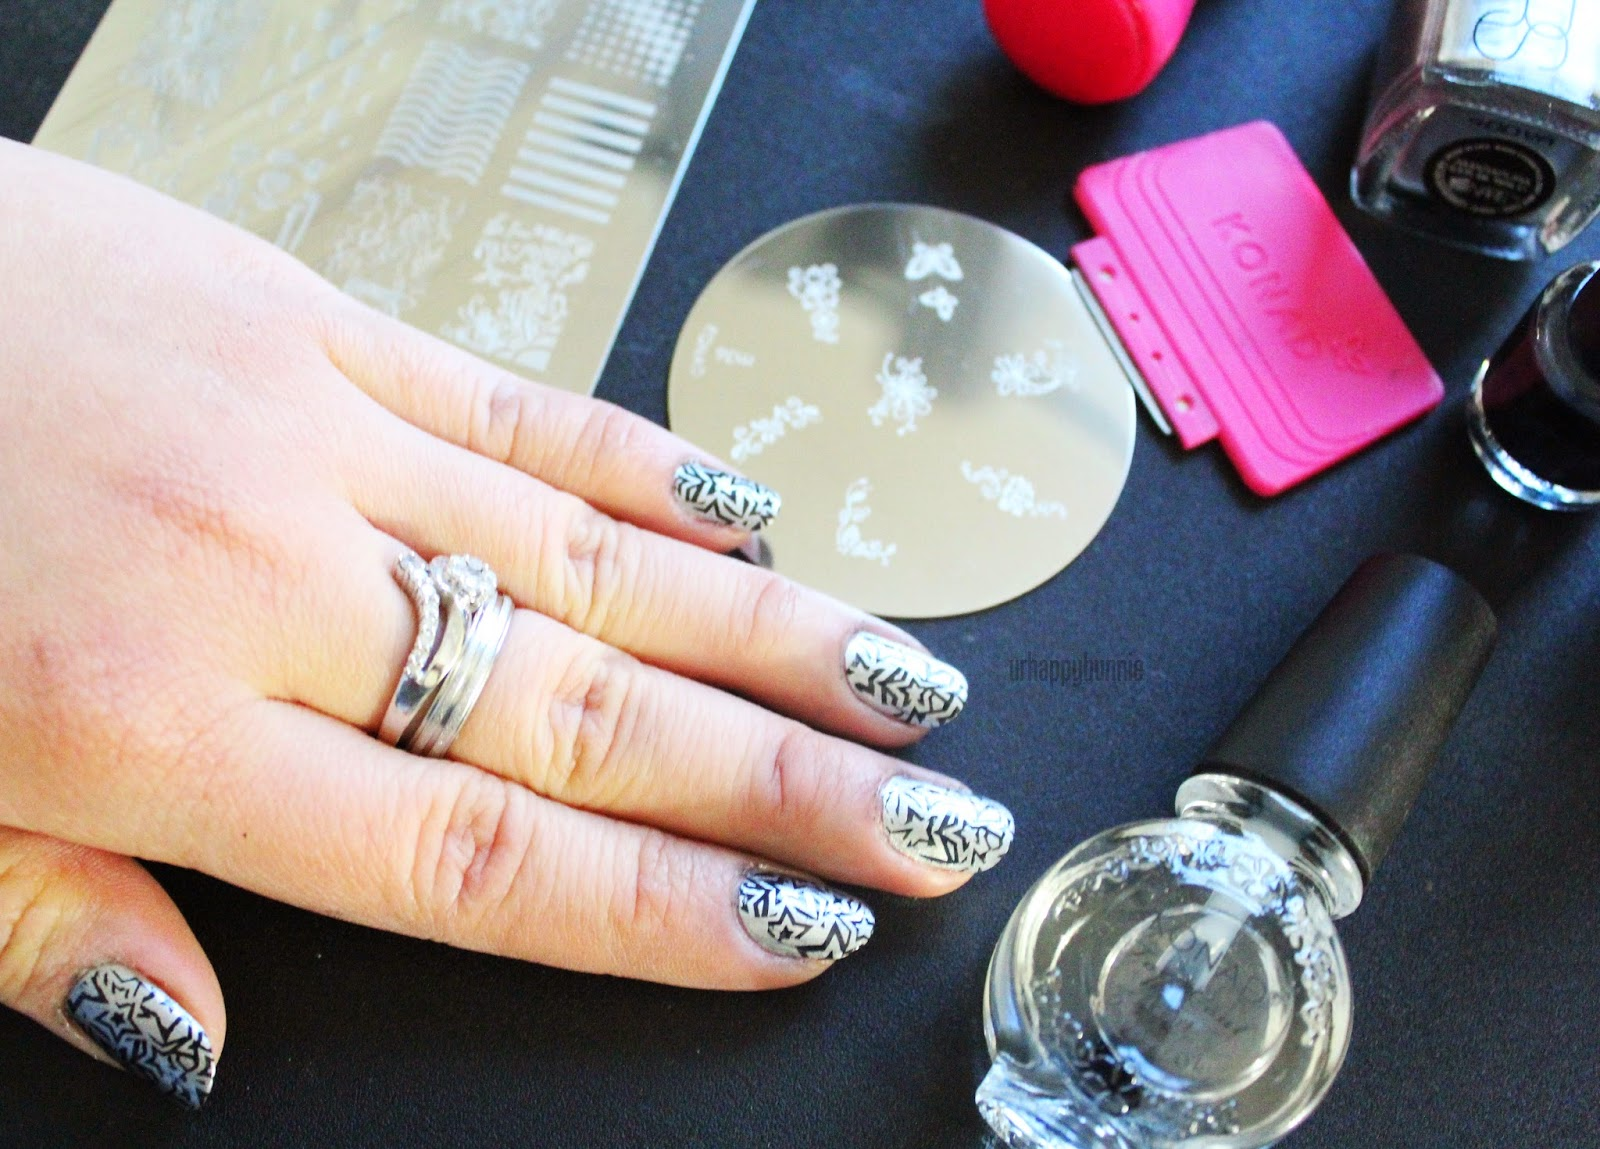 Urhappybunnie Konad Stamping Nail Art Set Review